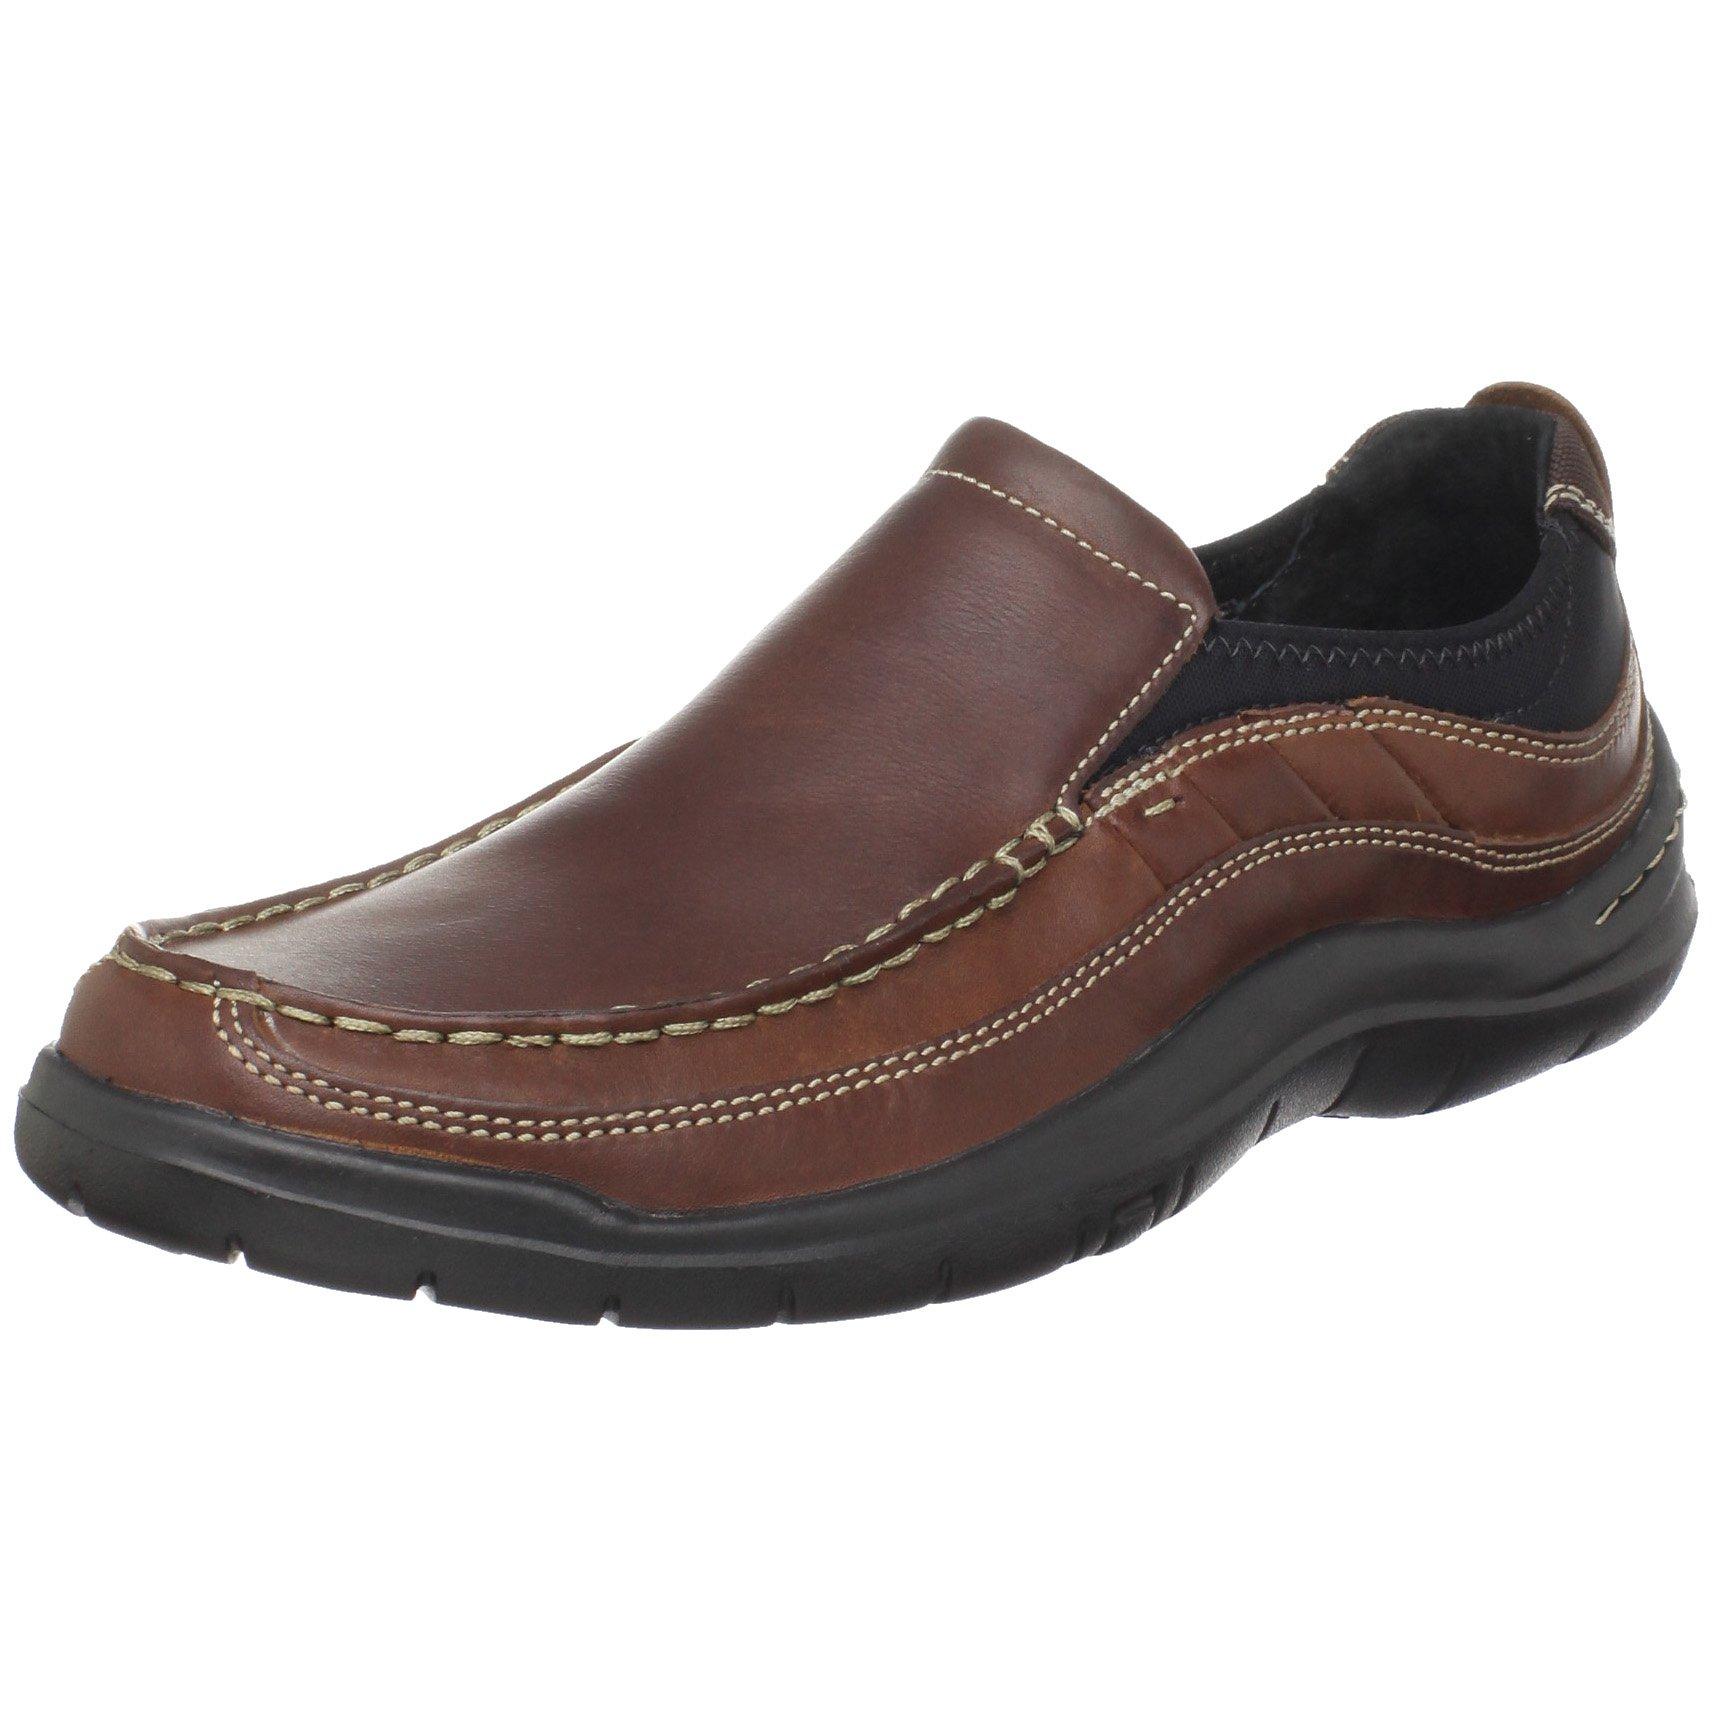 Clarks Men's Axl Moc Toe Slip-On,Brown,7 M US